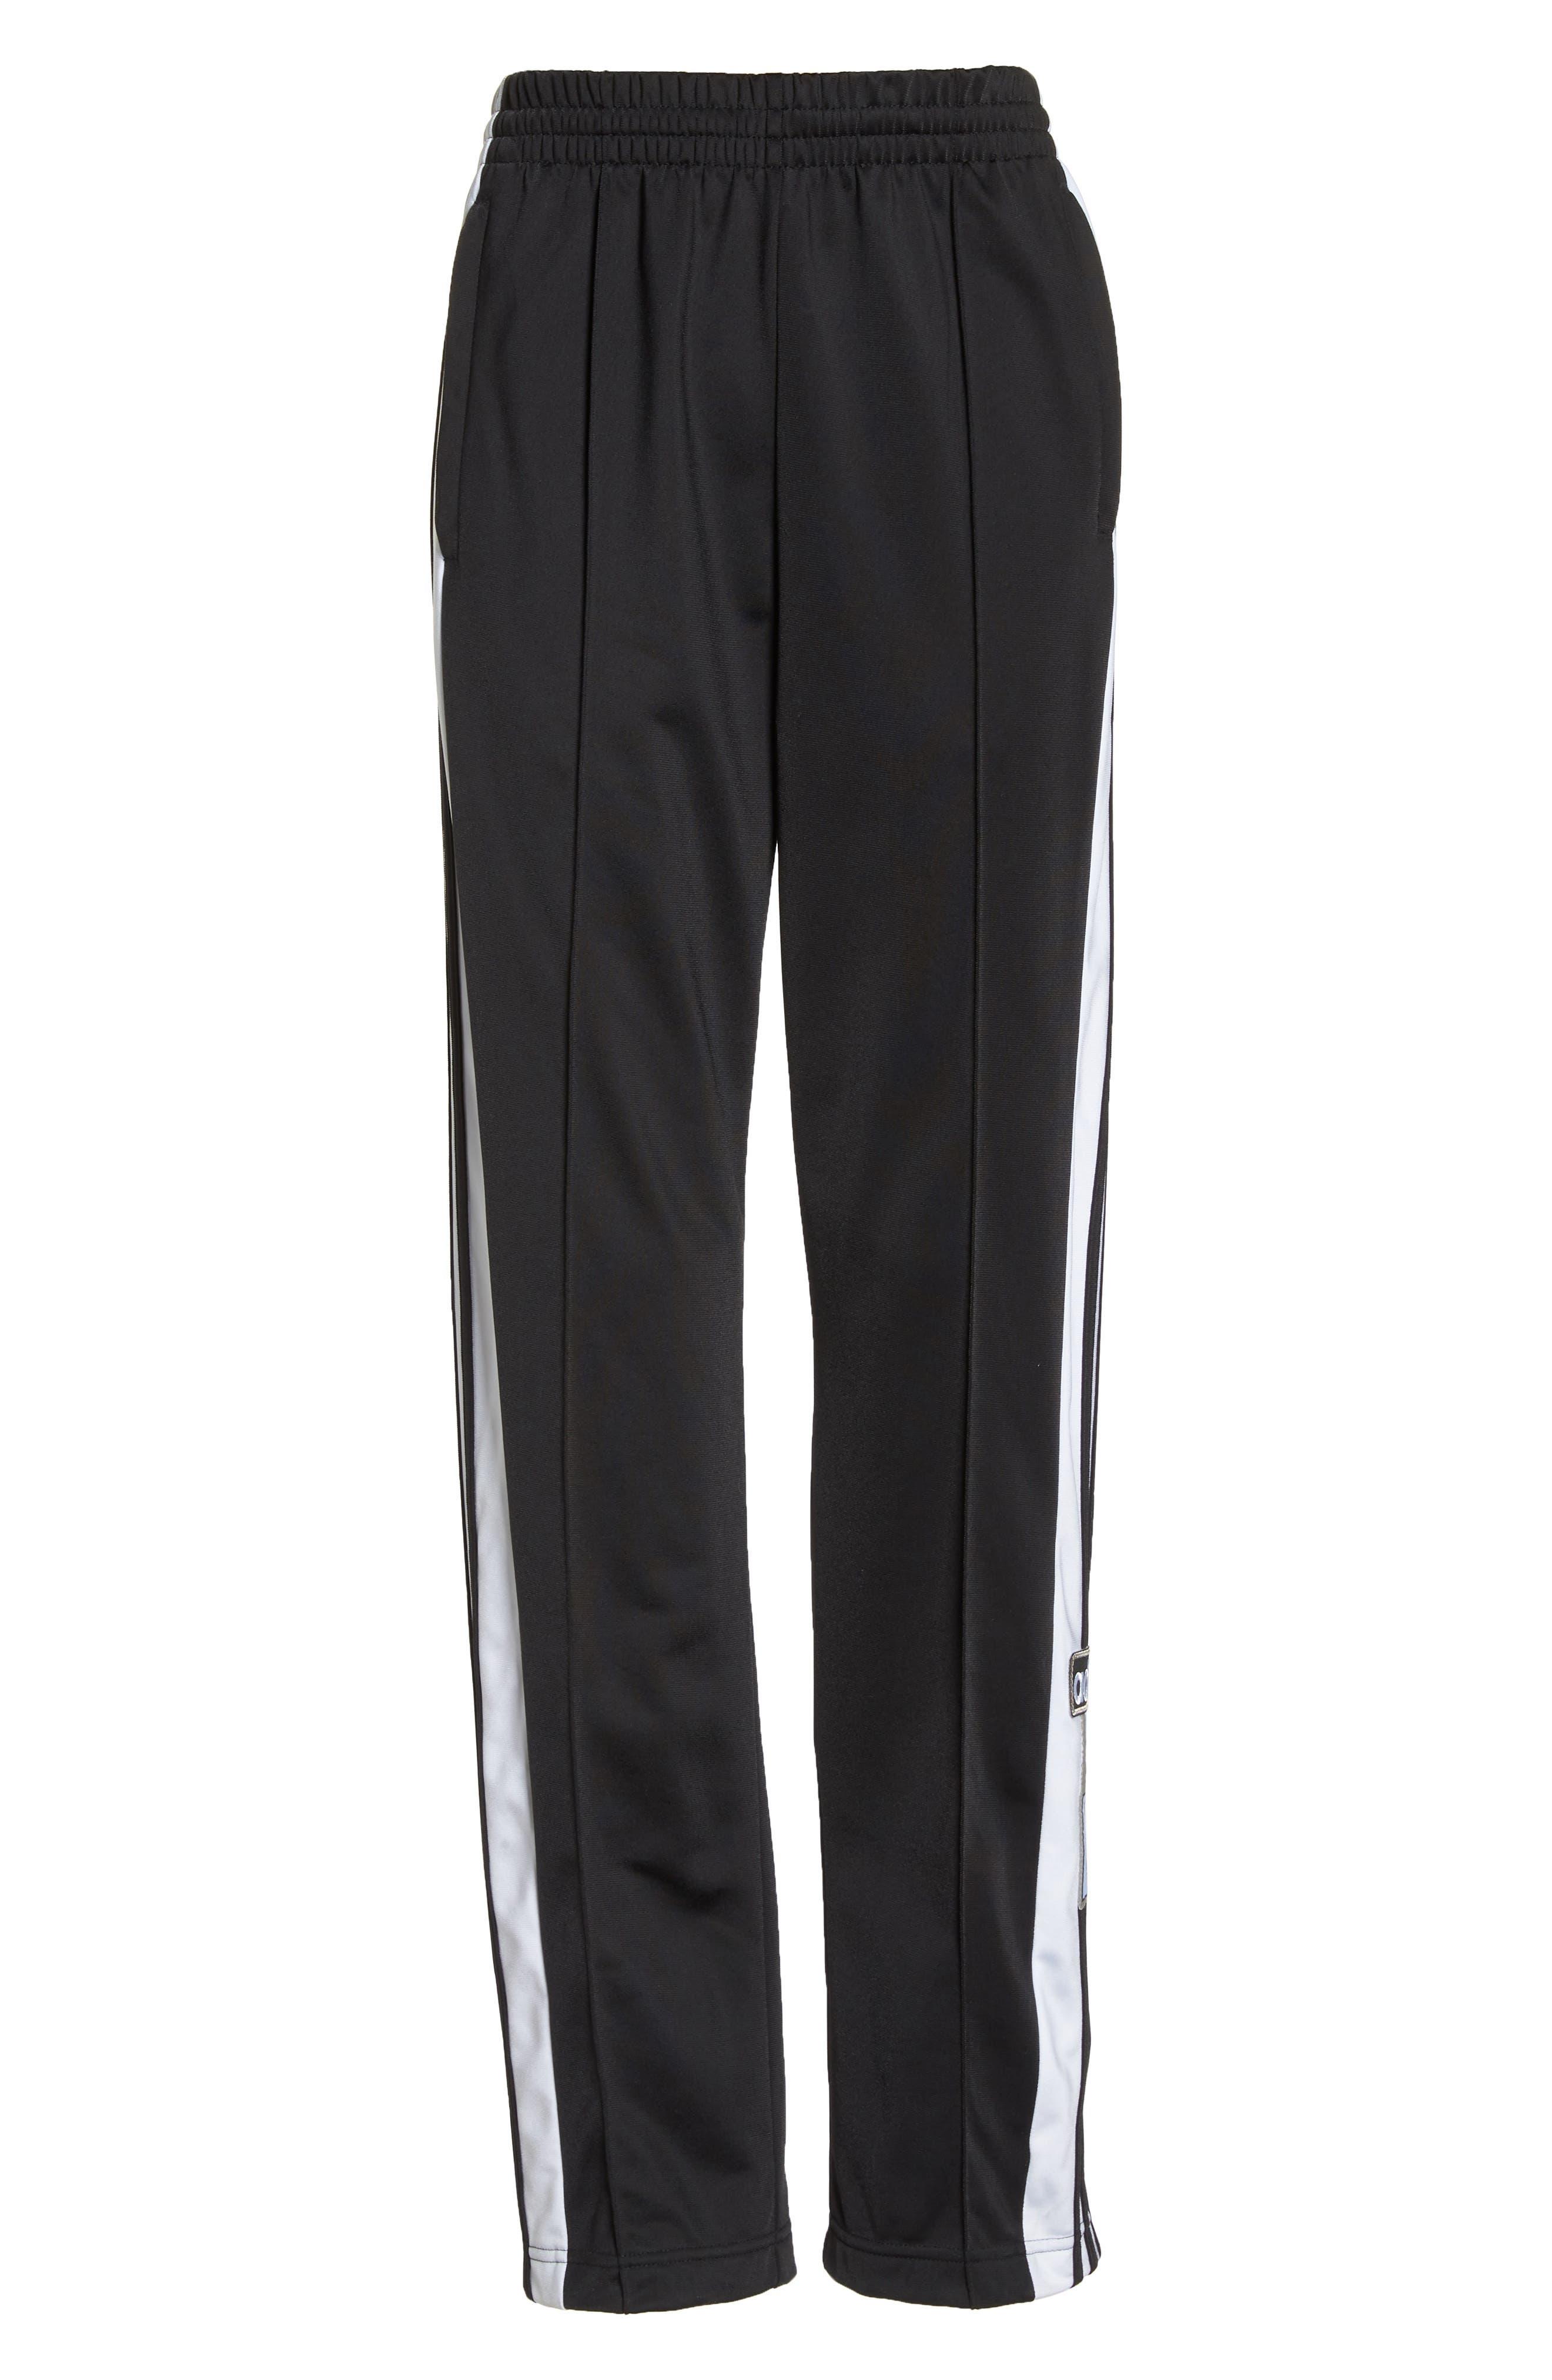 Adibreak Tearaway Track Pants,                             Alternate thumbnail 7, color,                             BLACK/ CARBON